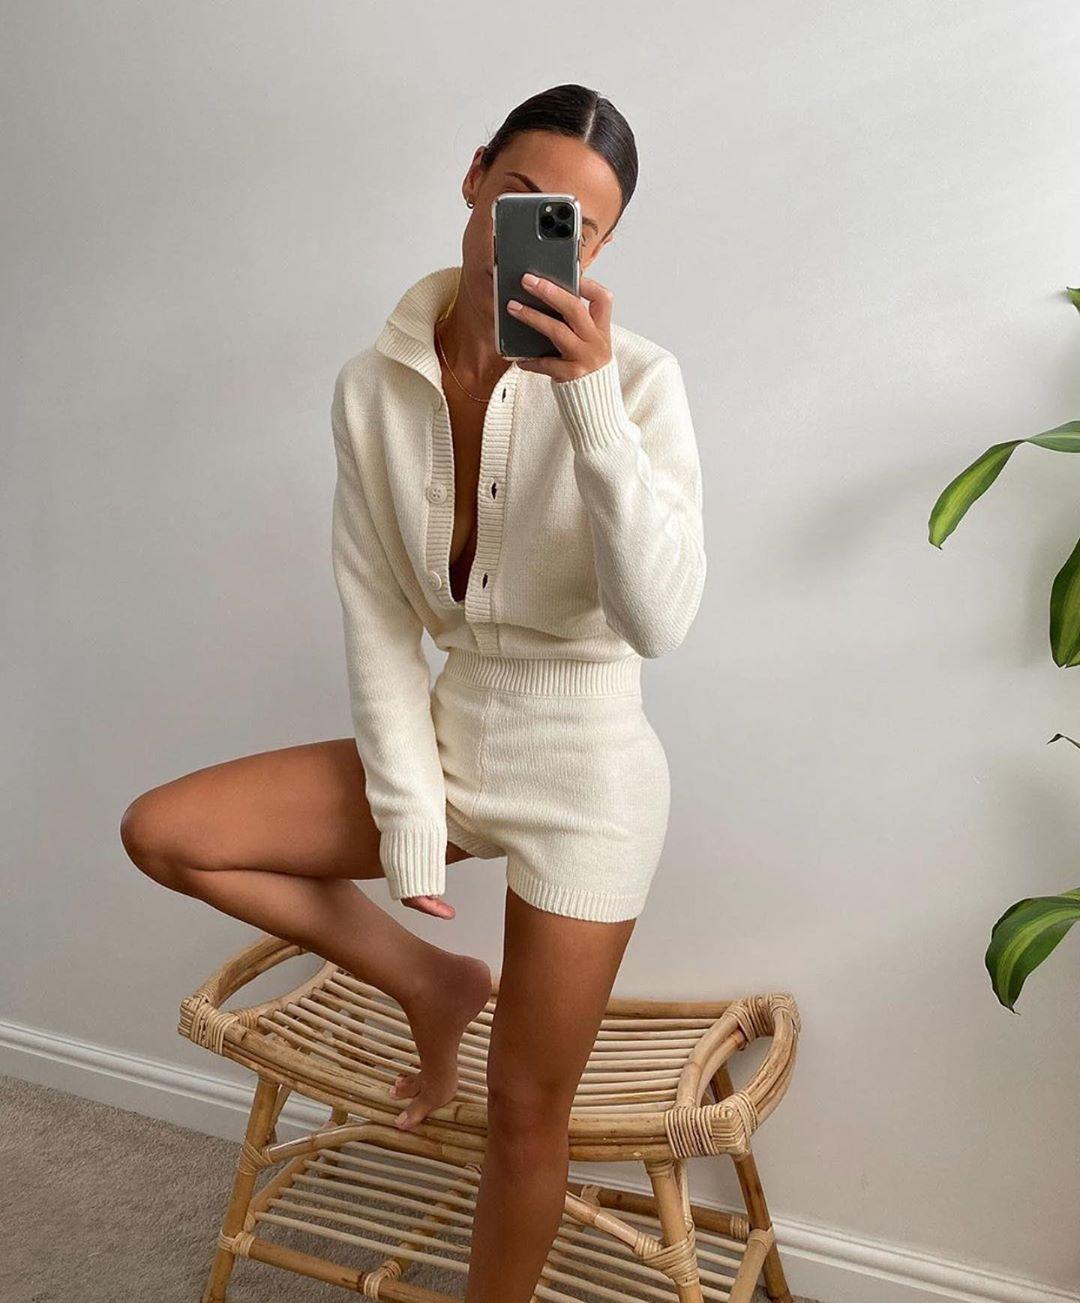 combinaison en maille limited edition de Zara sur zara.outfits